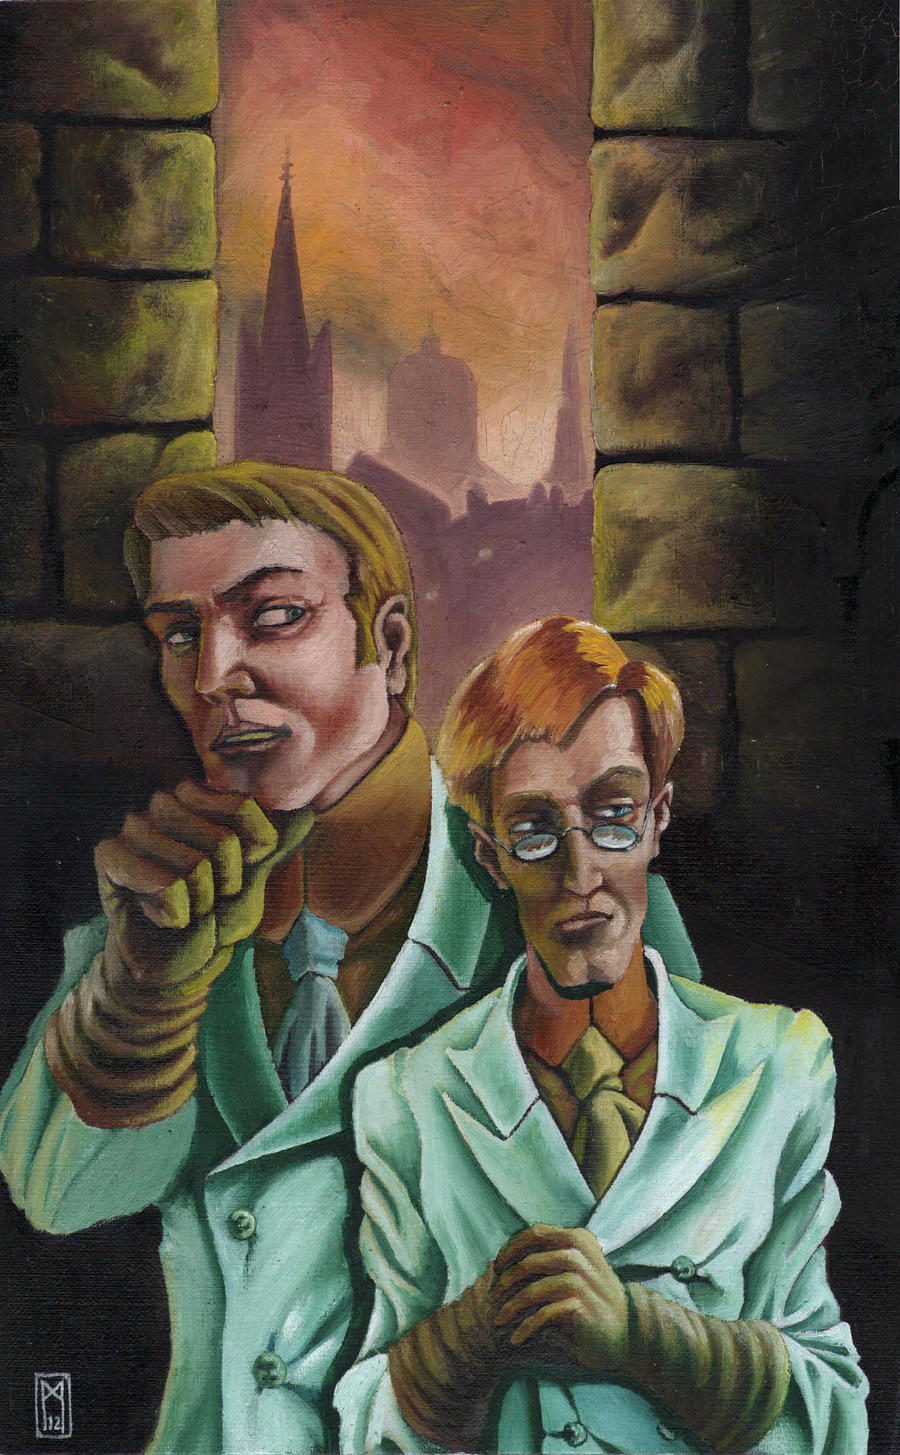 Lovecraft Project: Herbert West by HavetVargar